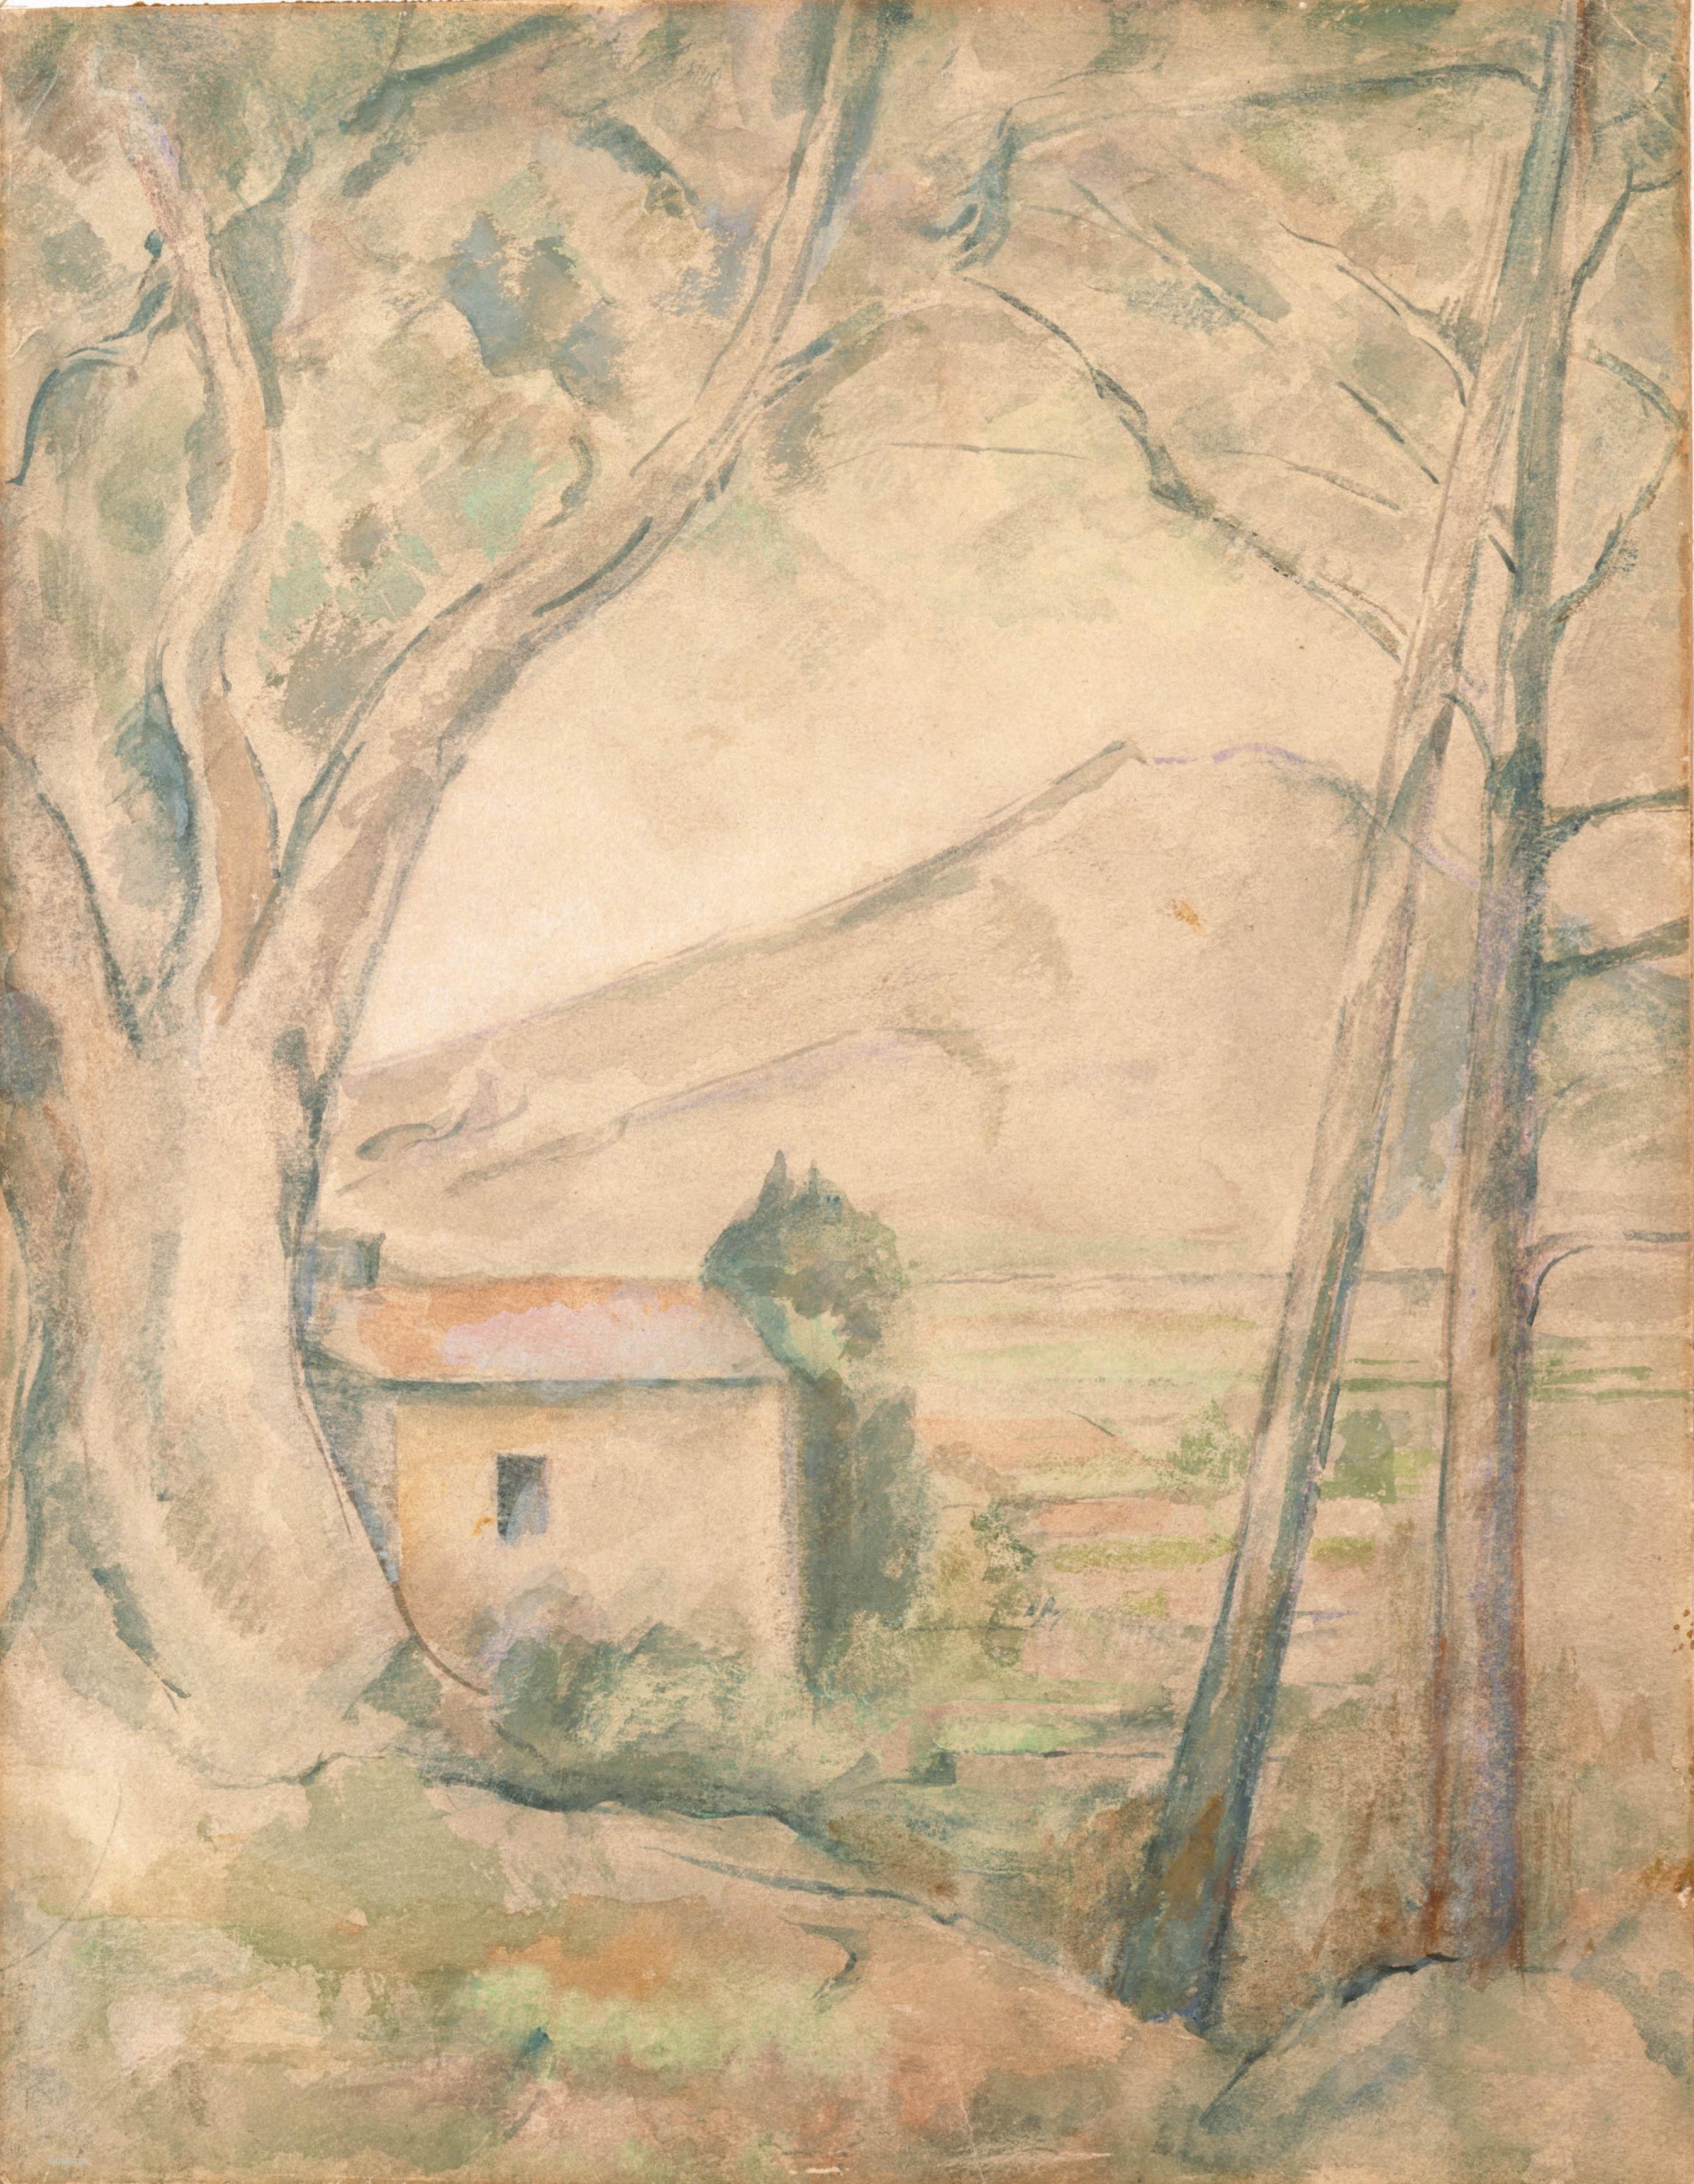 Сезанн рисунок Mont Sainte-Victoire пейзажи природы Сафиуллин акварель 1904